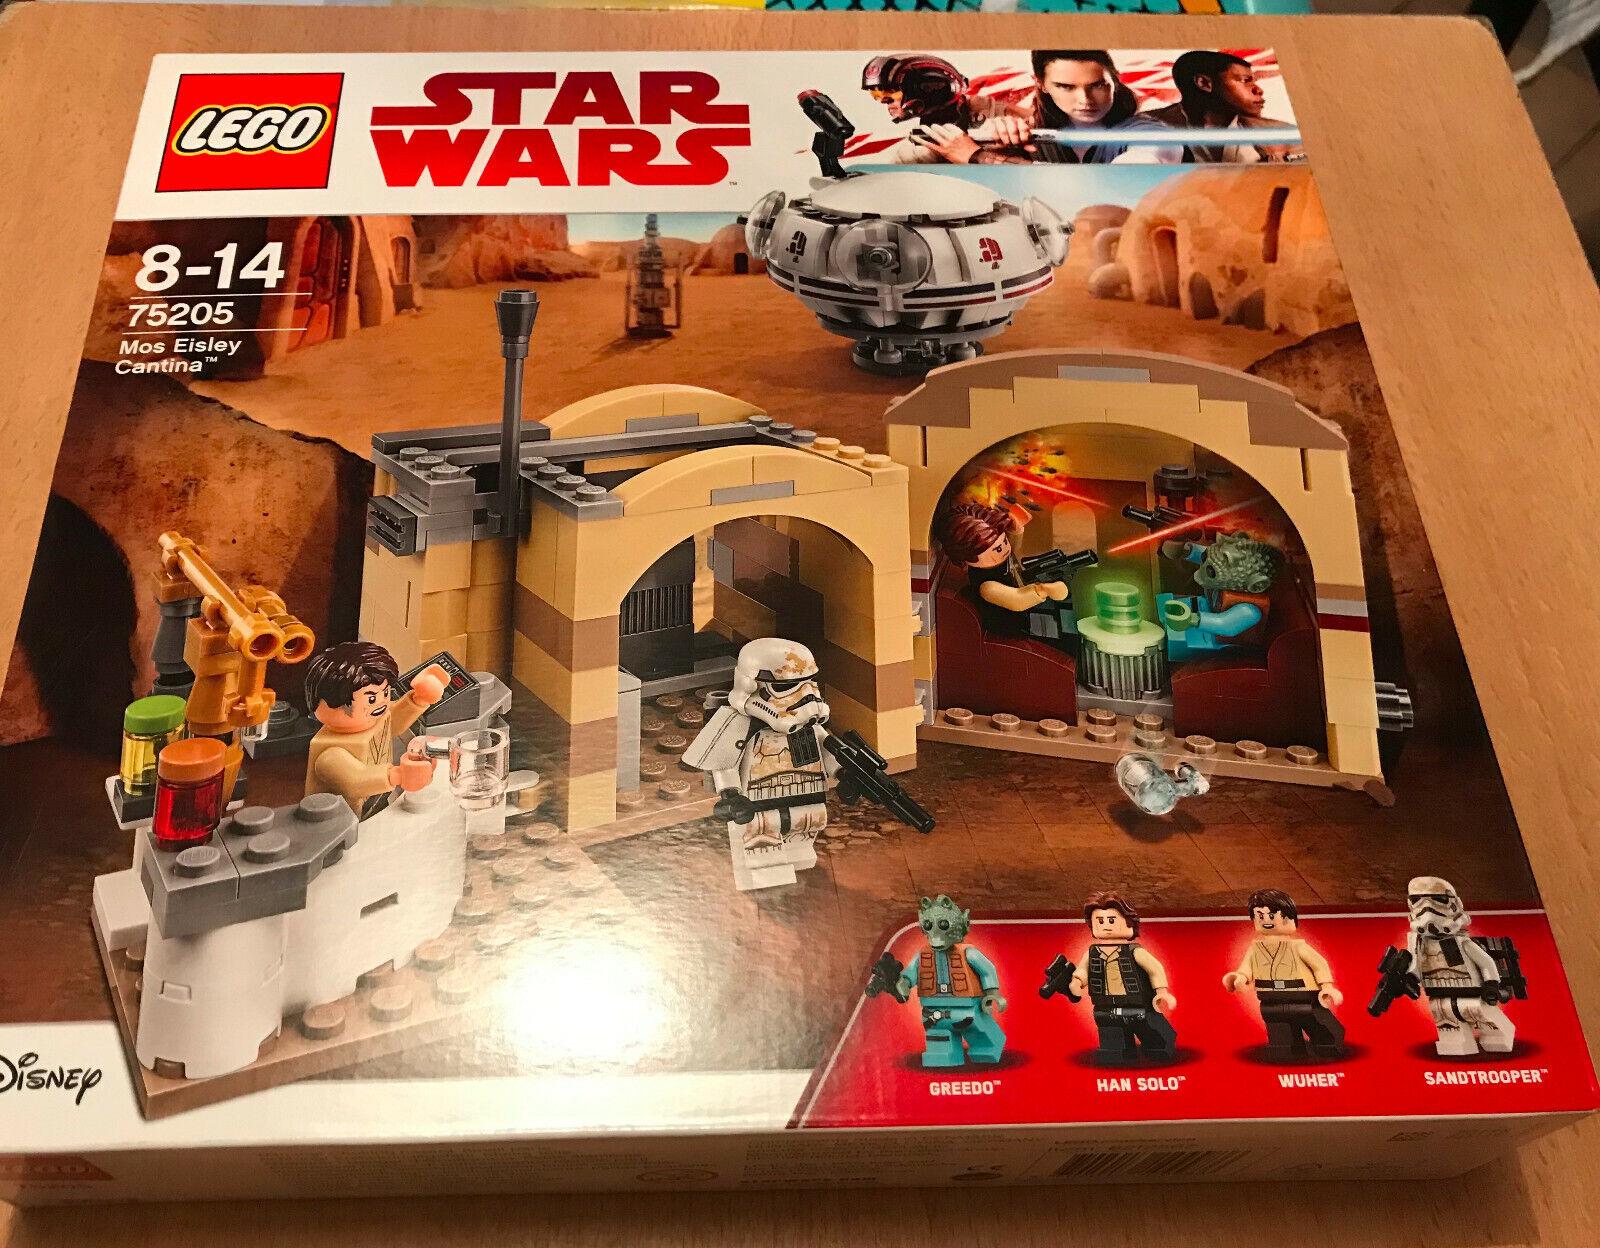 BOITE SET LEGO VAISSEAU STAR WARS 75205 LA CANTINA DE MOS EISLEY AVEC GREEDO